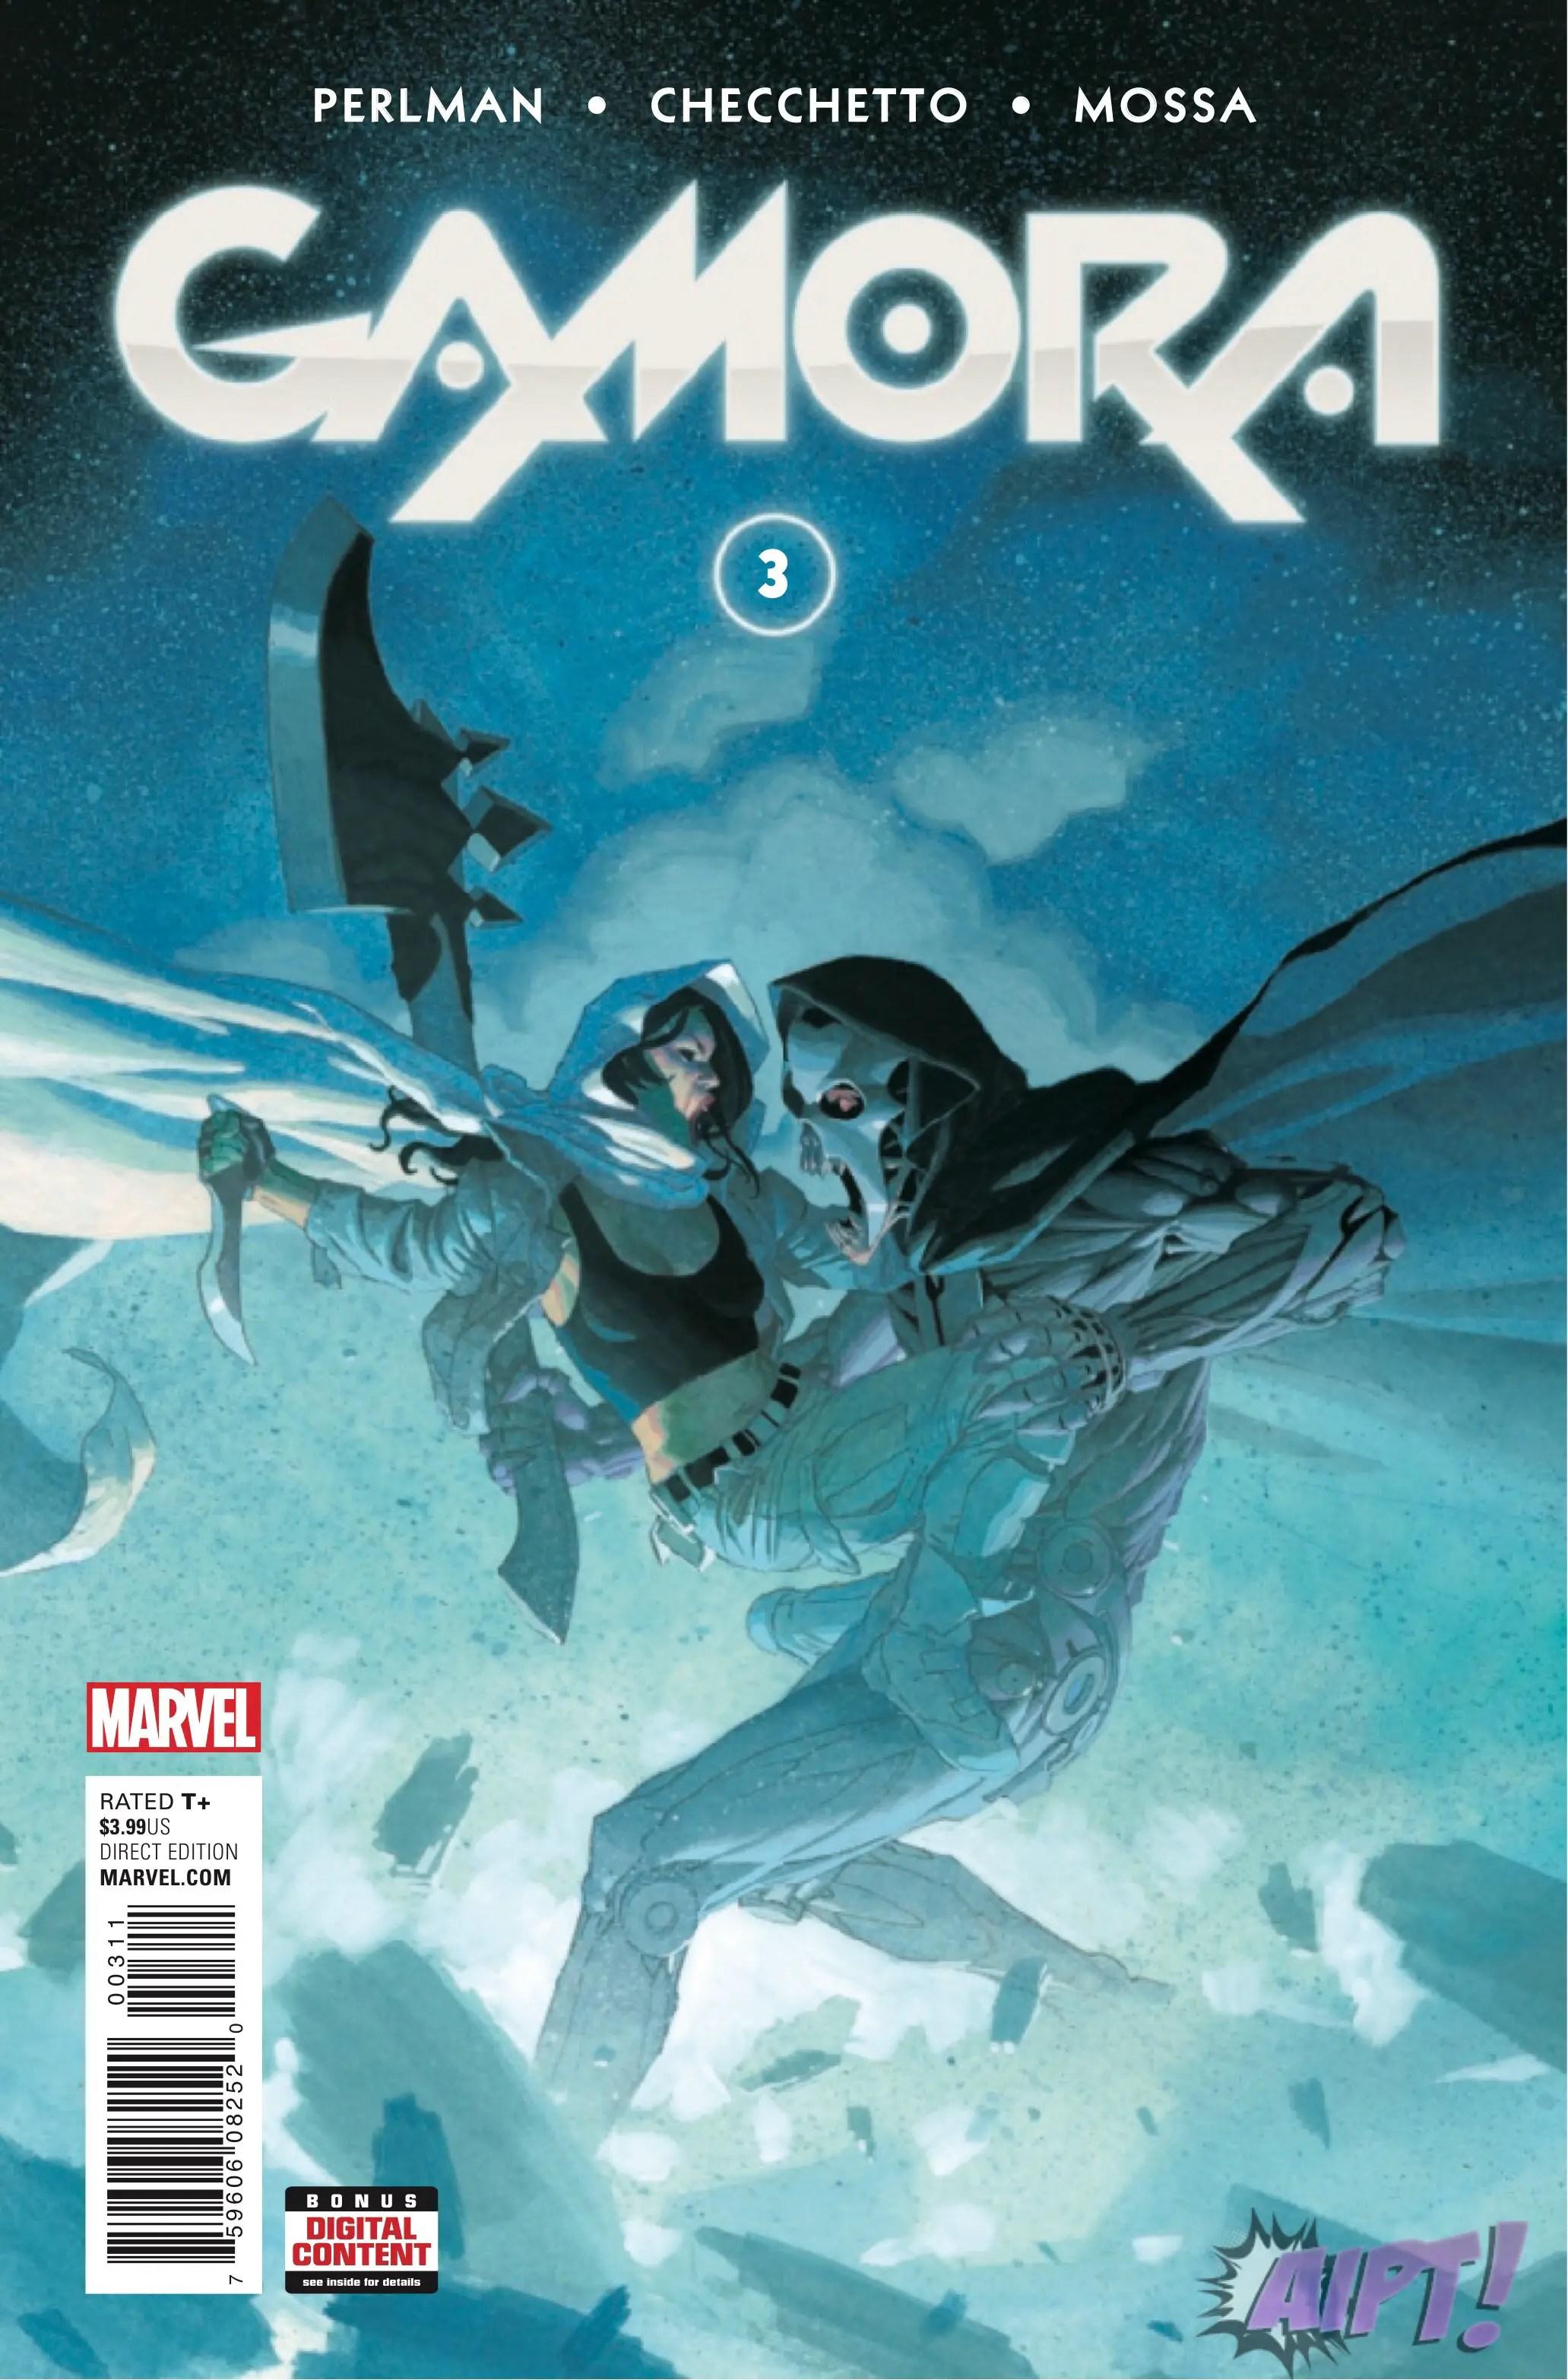 Gamora #3 Review